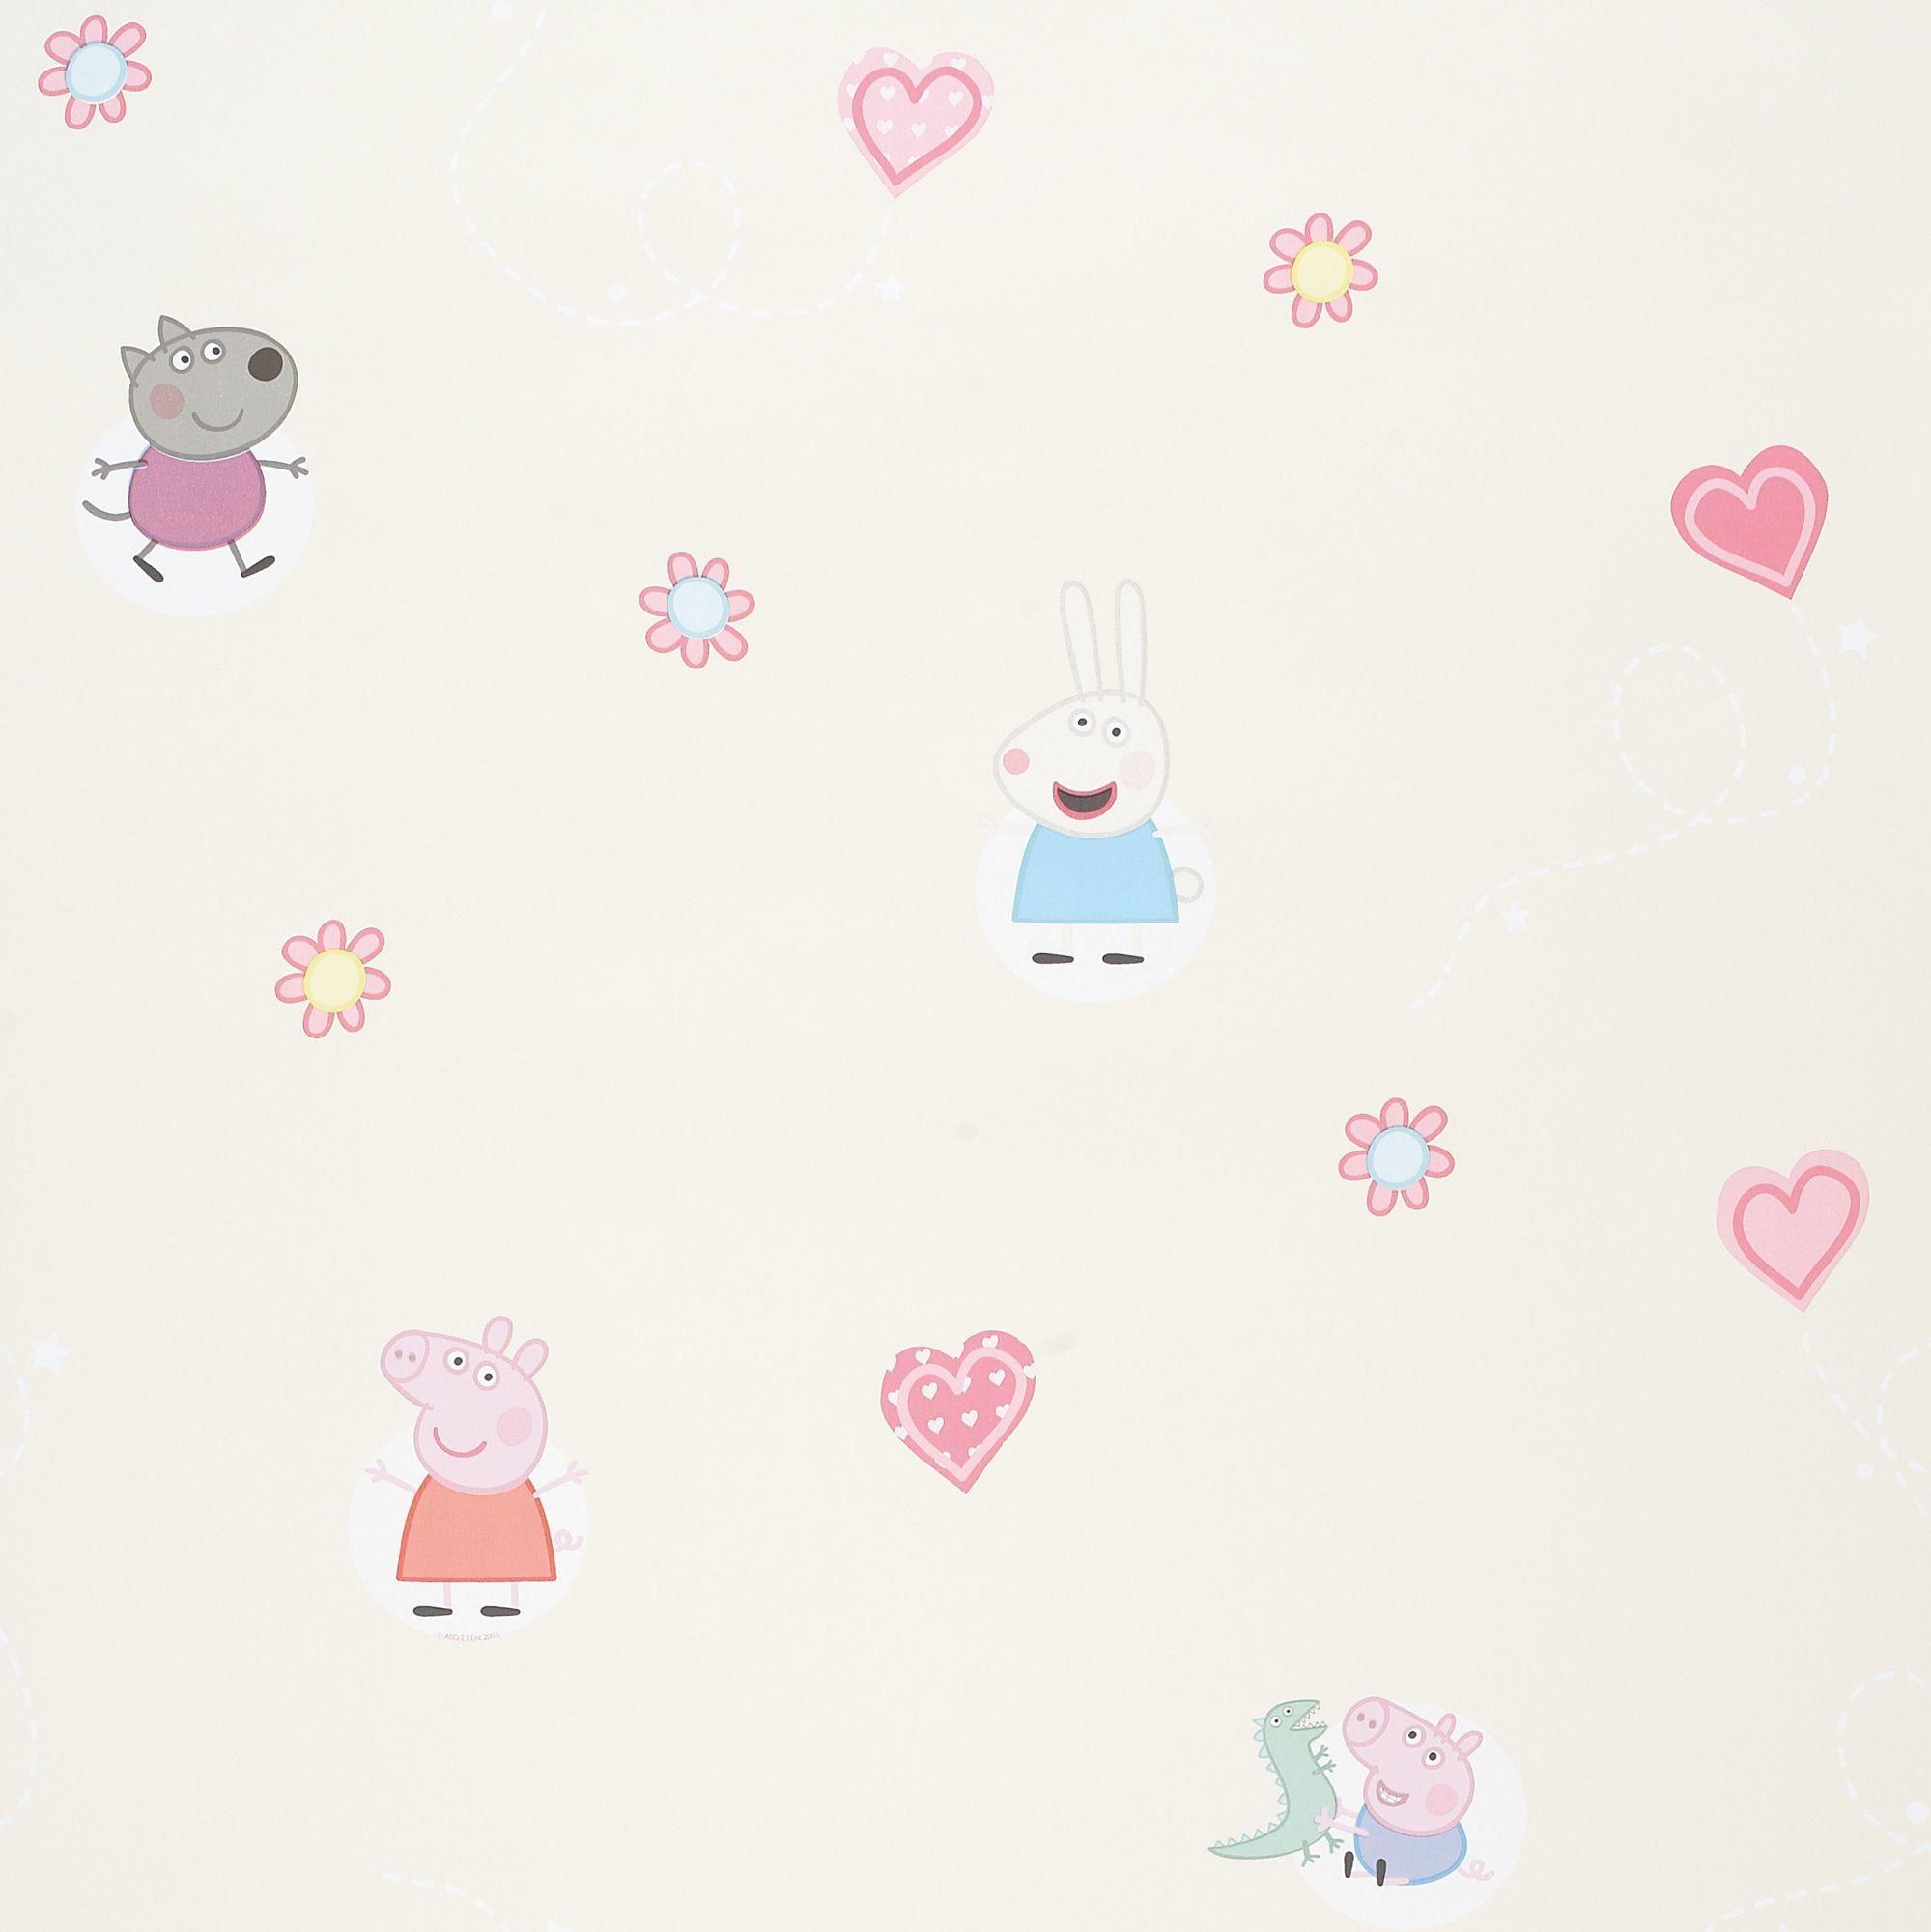 Peppa Pig HD Wallpaper   HD Wallpapers   Pinterest   Pig wallpaper, Hd  wallpaper and Wallpaper